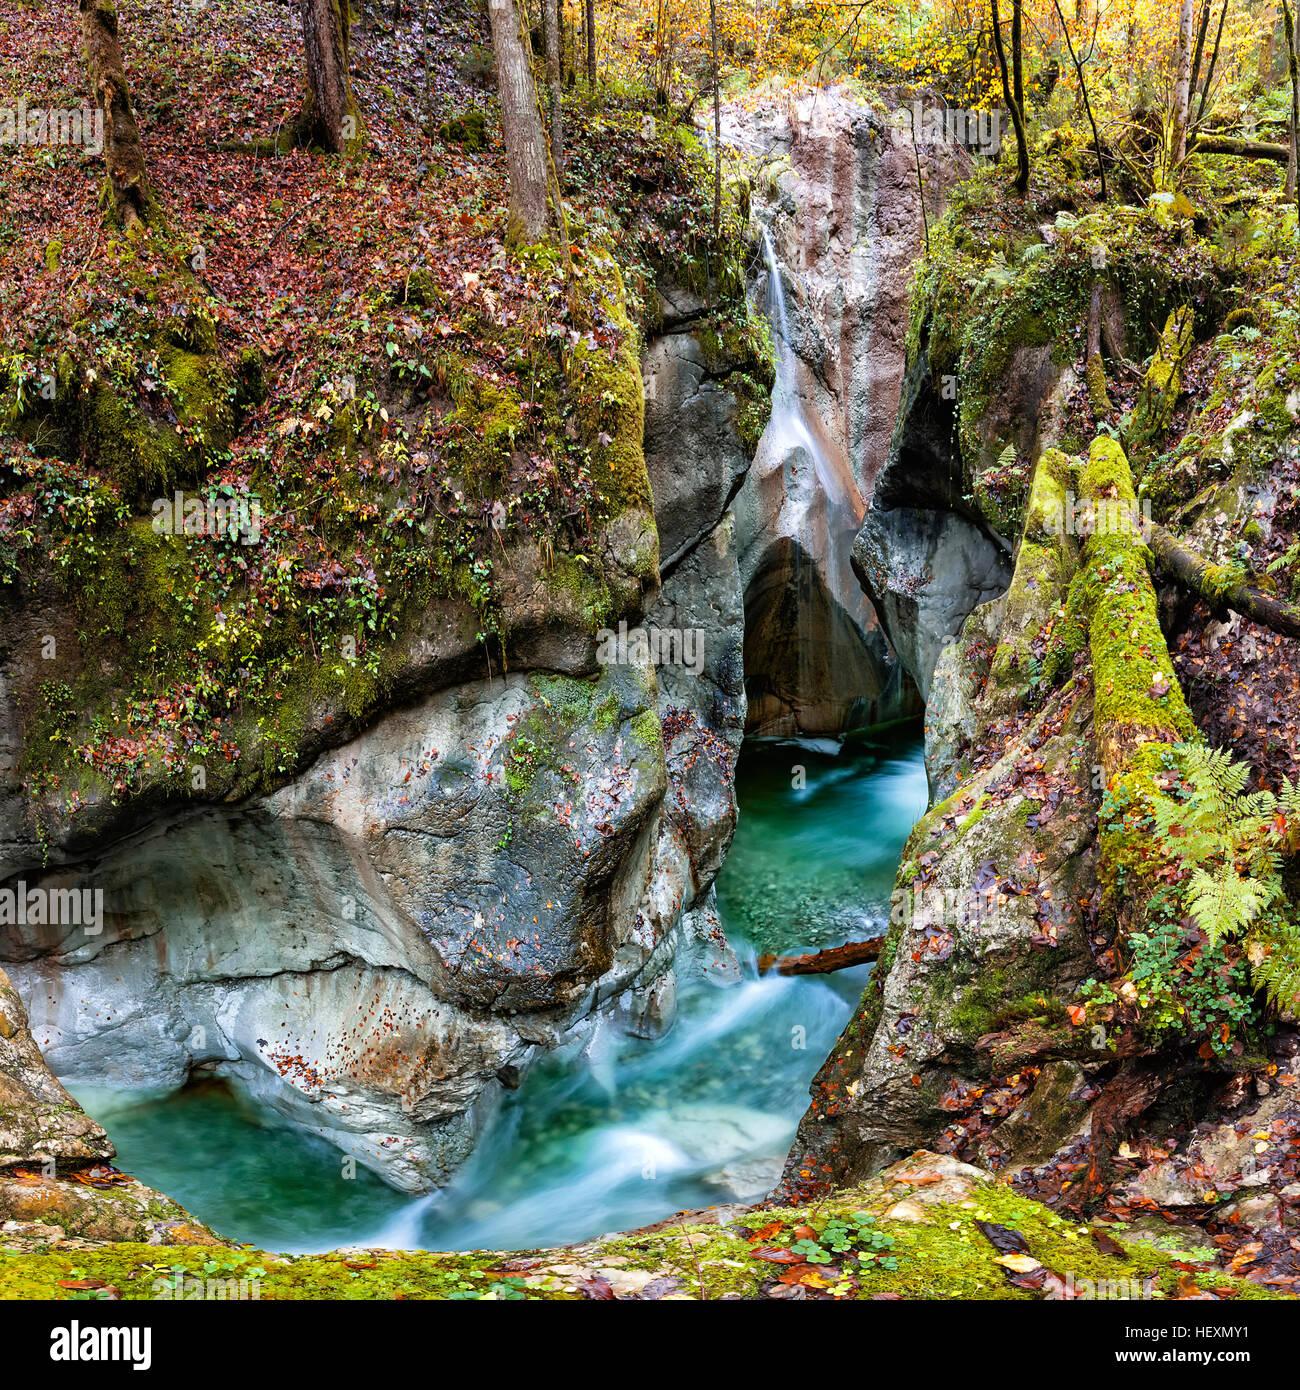 Austria, Tennegau, Taugl river at Strubklamm gorge Stock Photo